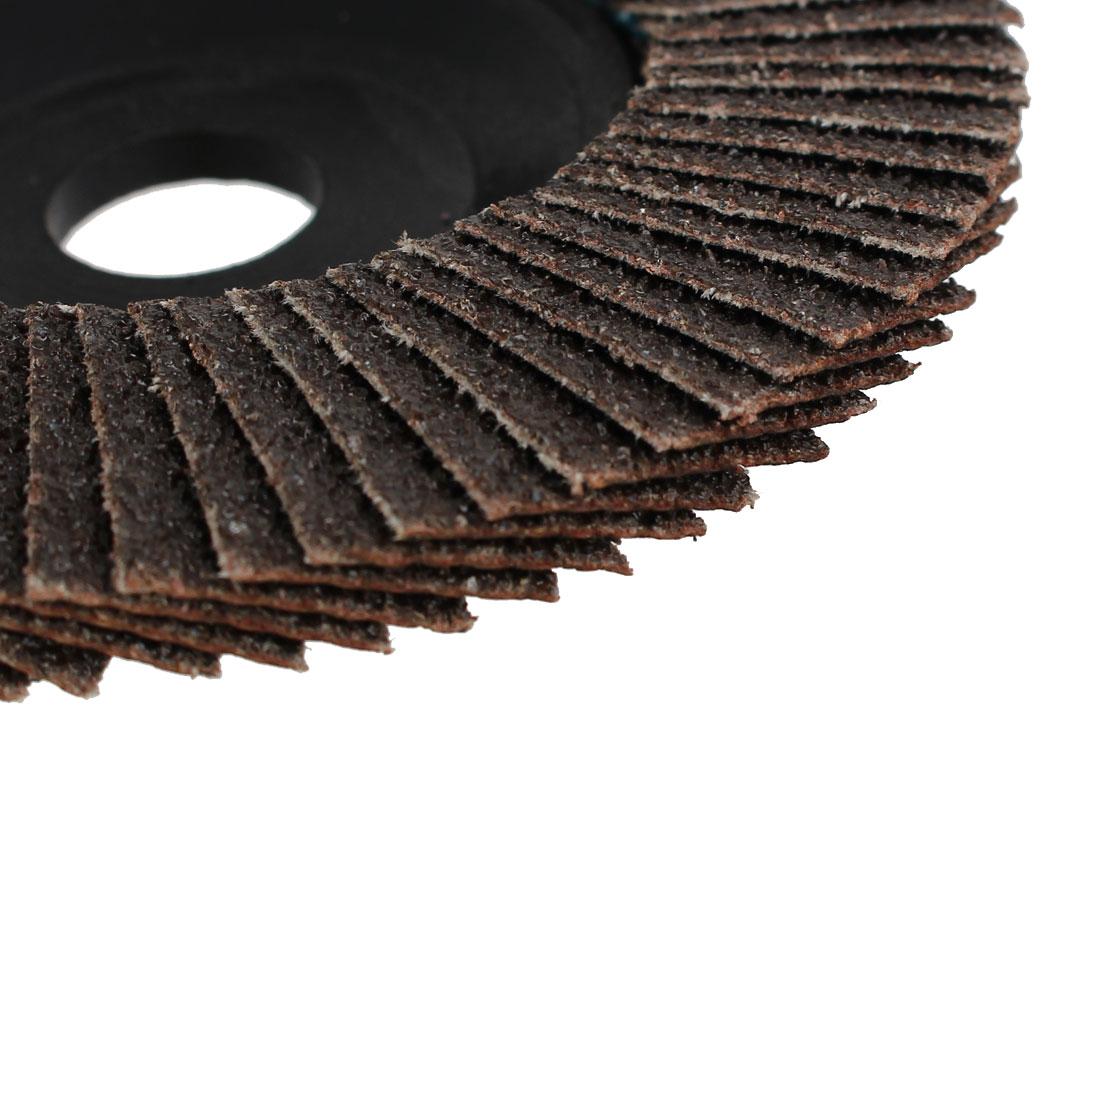 100mm x 16mm Flap Sanding Disc Polishing Grinding Wheels 60 Grit 10pcs - image 2 of 3